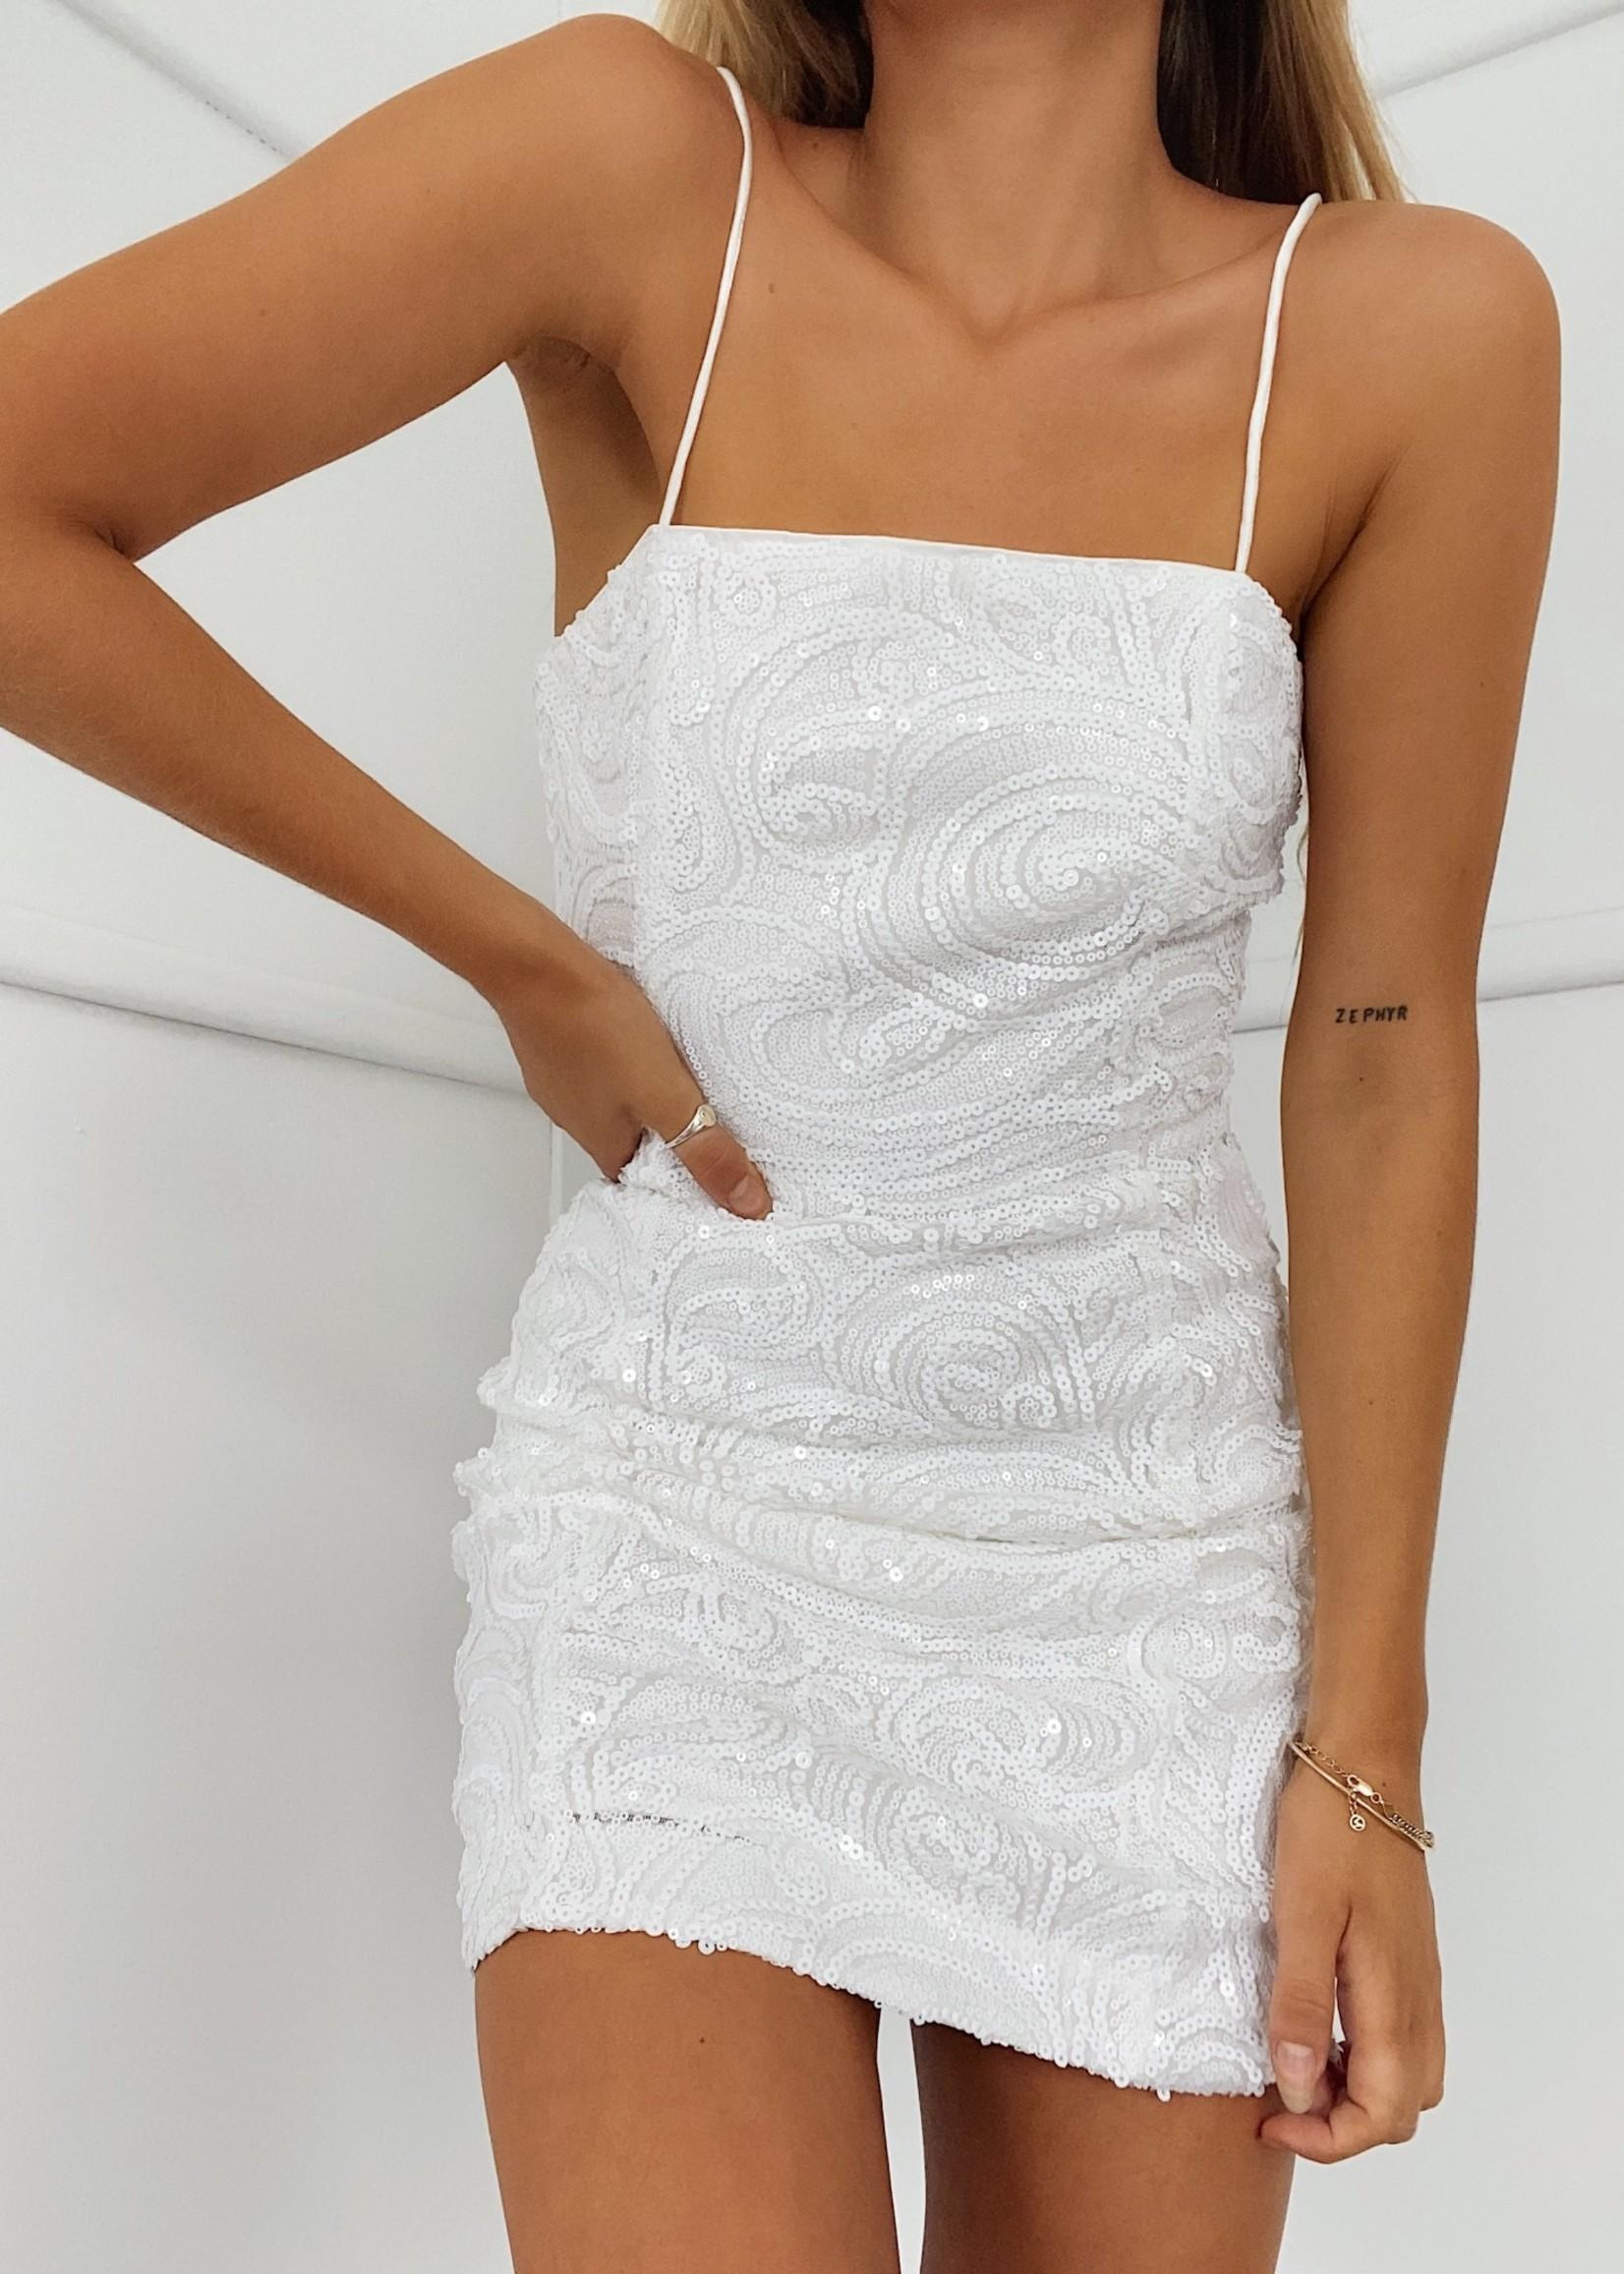 Runaway The Label White Ivy Dress